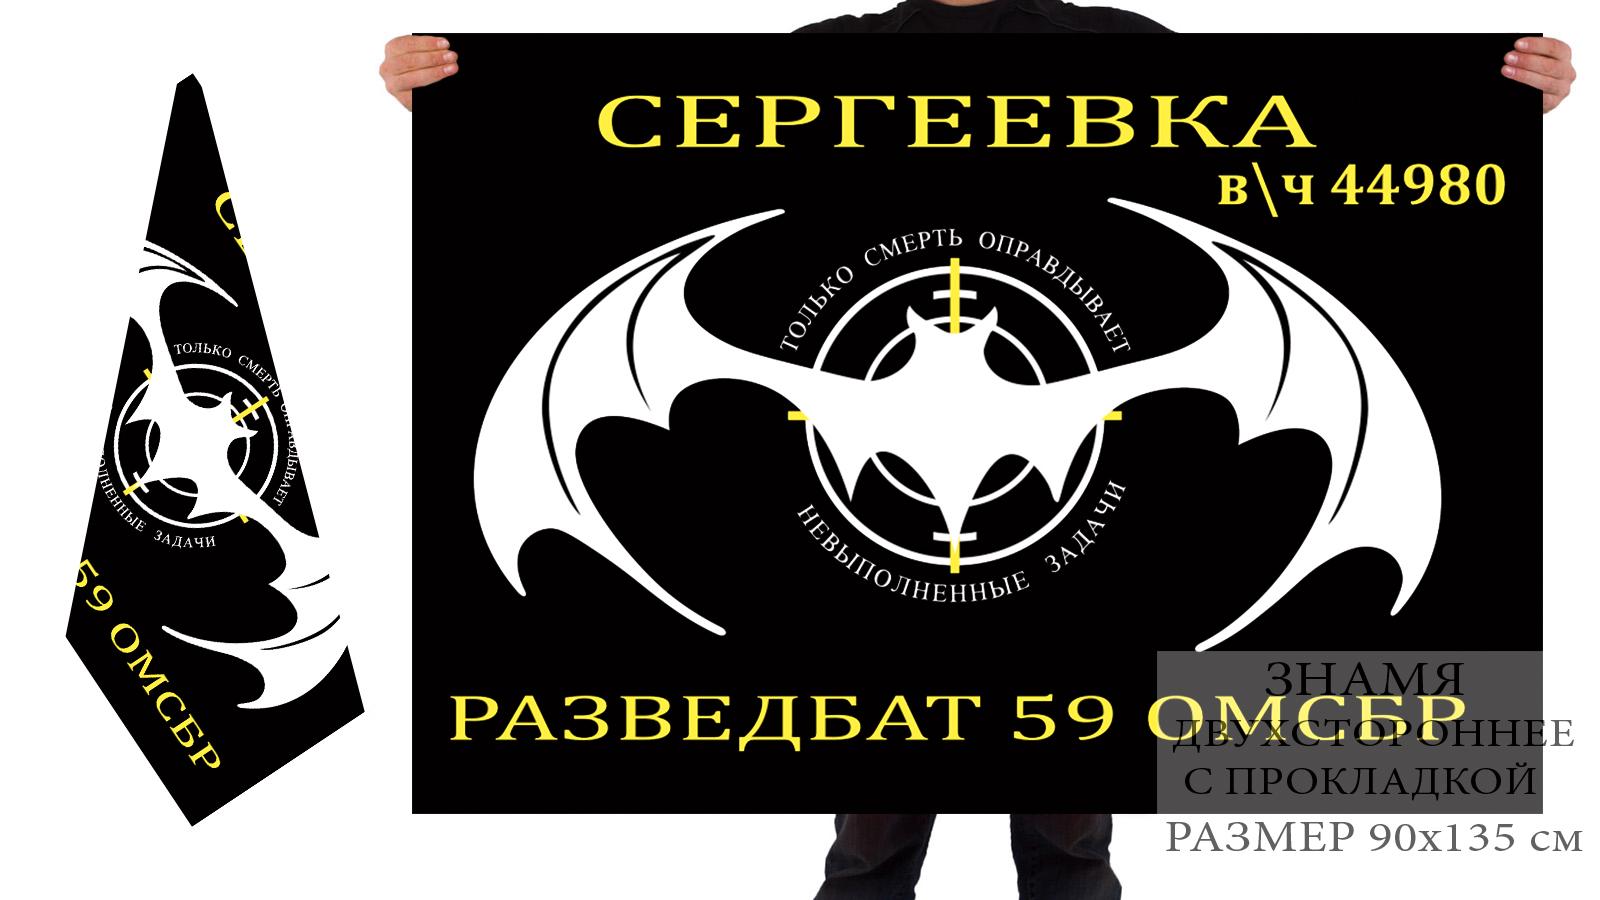 Двусторонний флаг разведбата 59 ОМСБР спецназа ГРУ